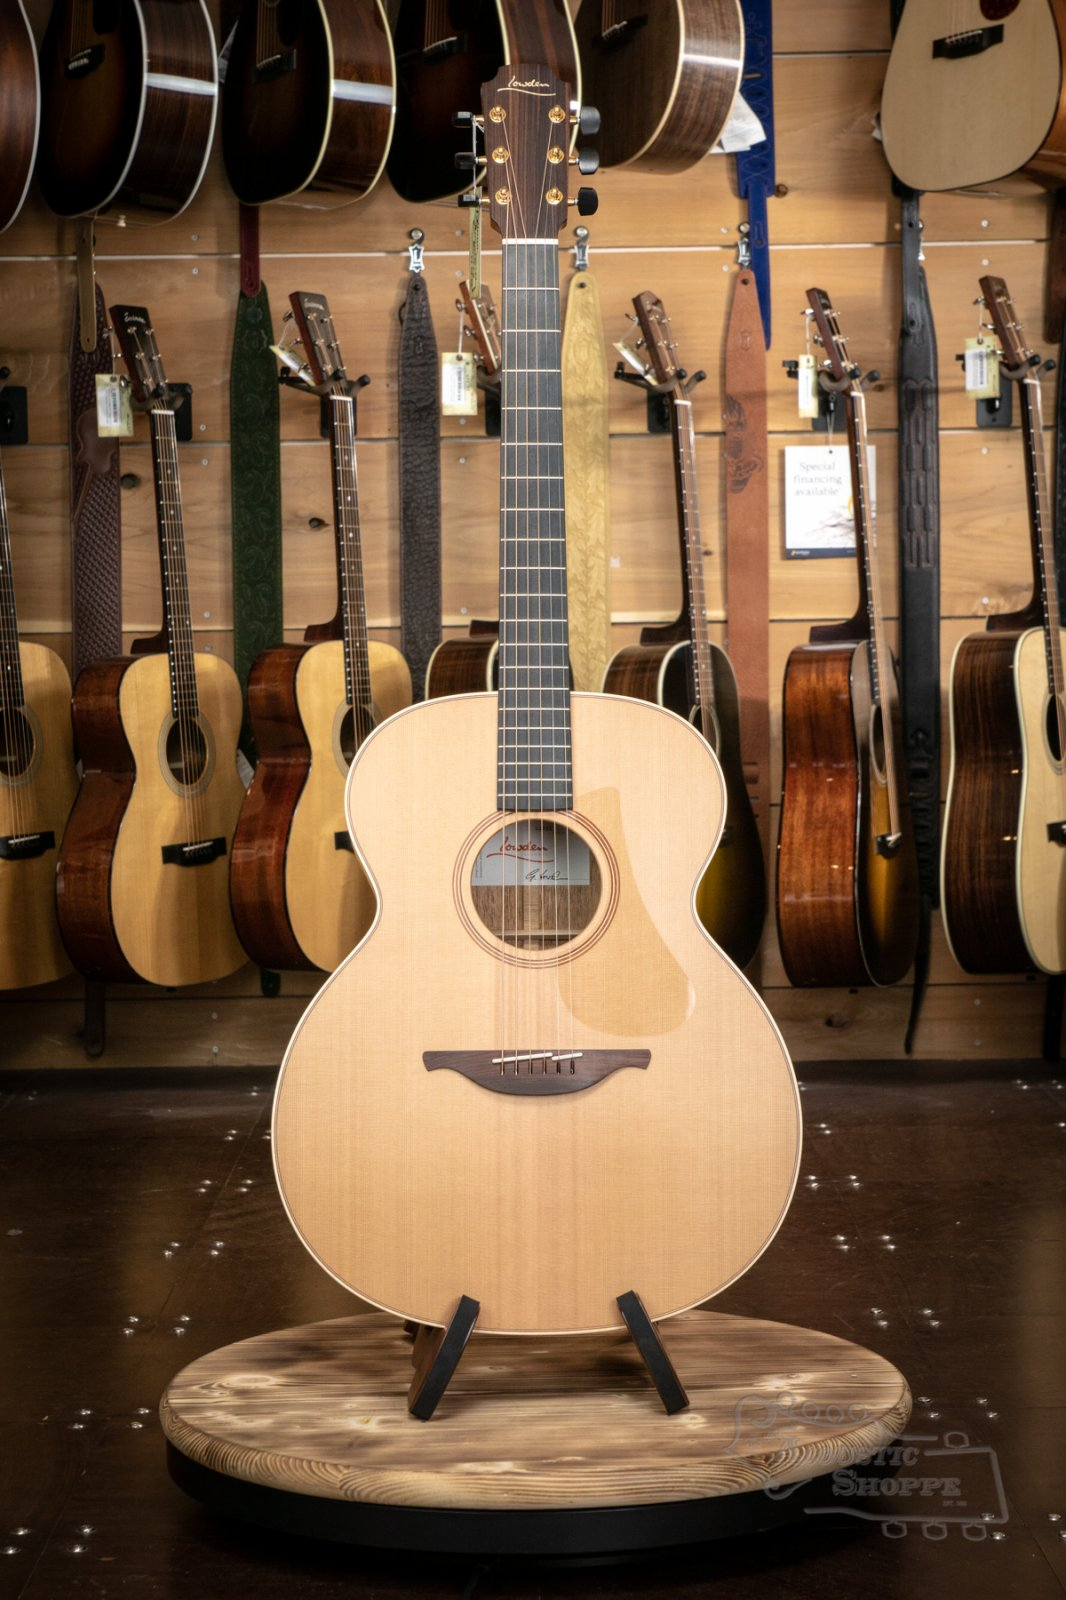 Lowden O-22 Cedar/Mahogany Acoustic Guitar #22355 Handmade in Ireland